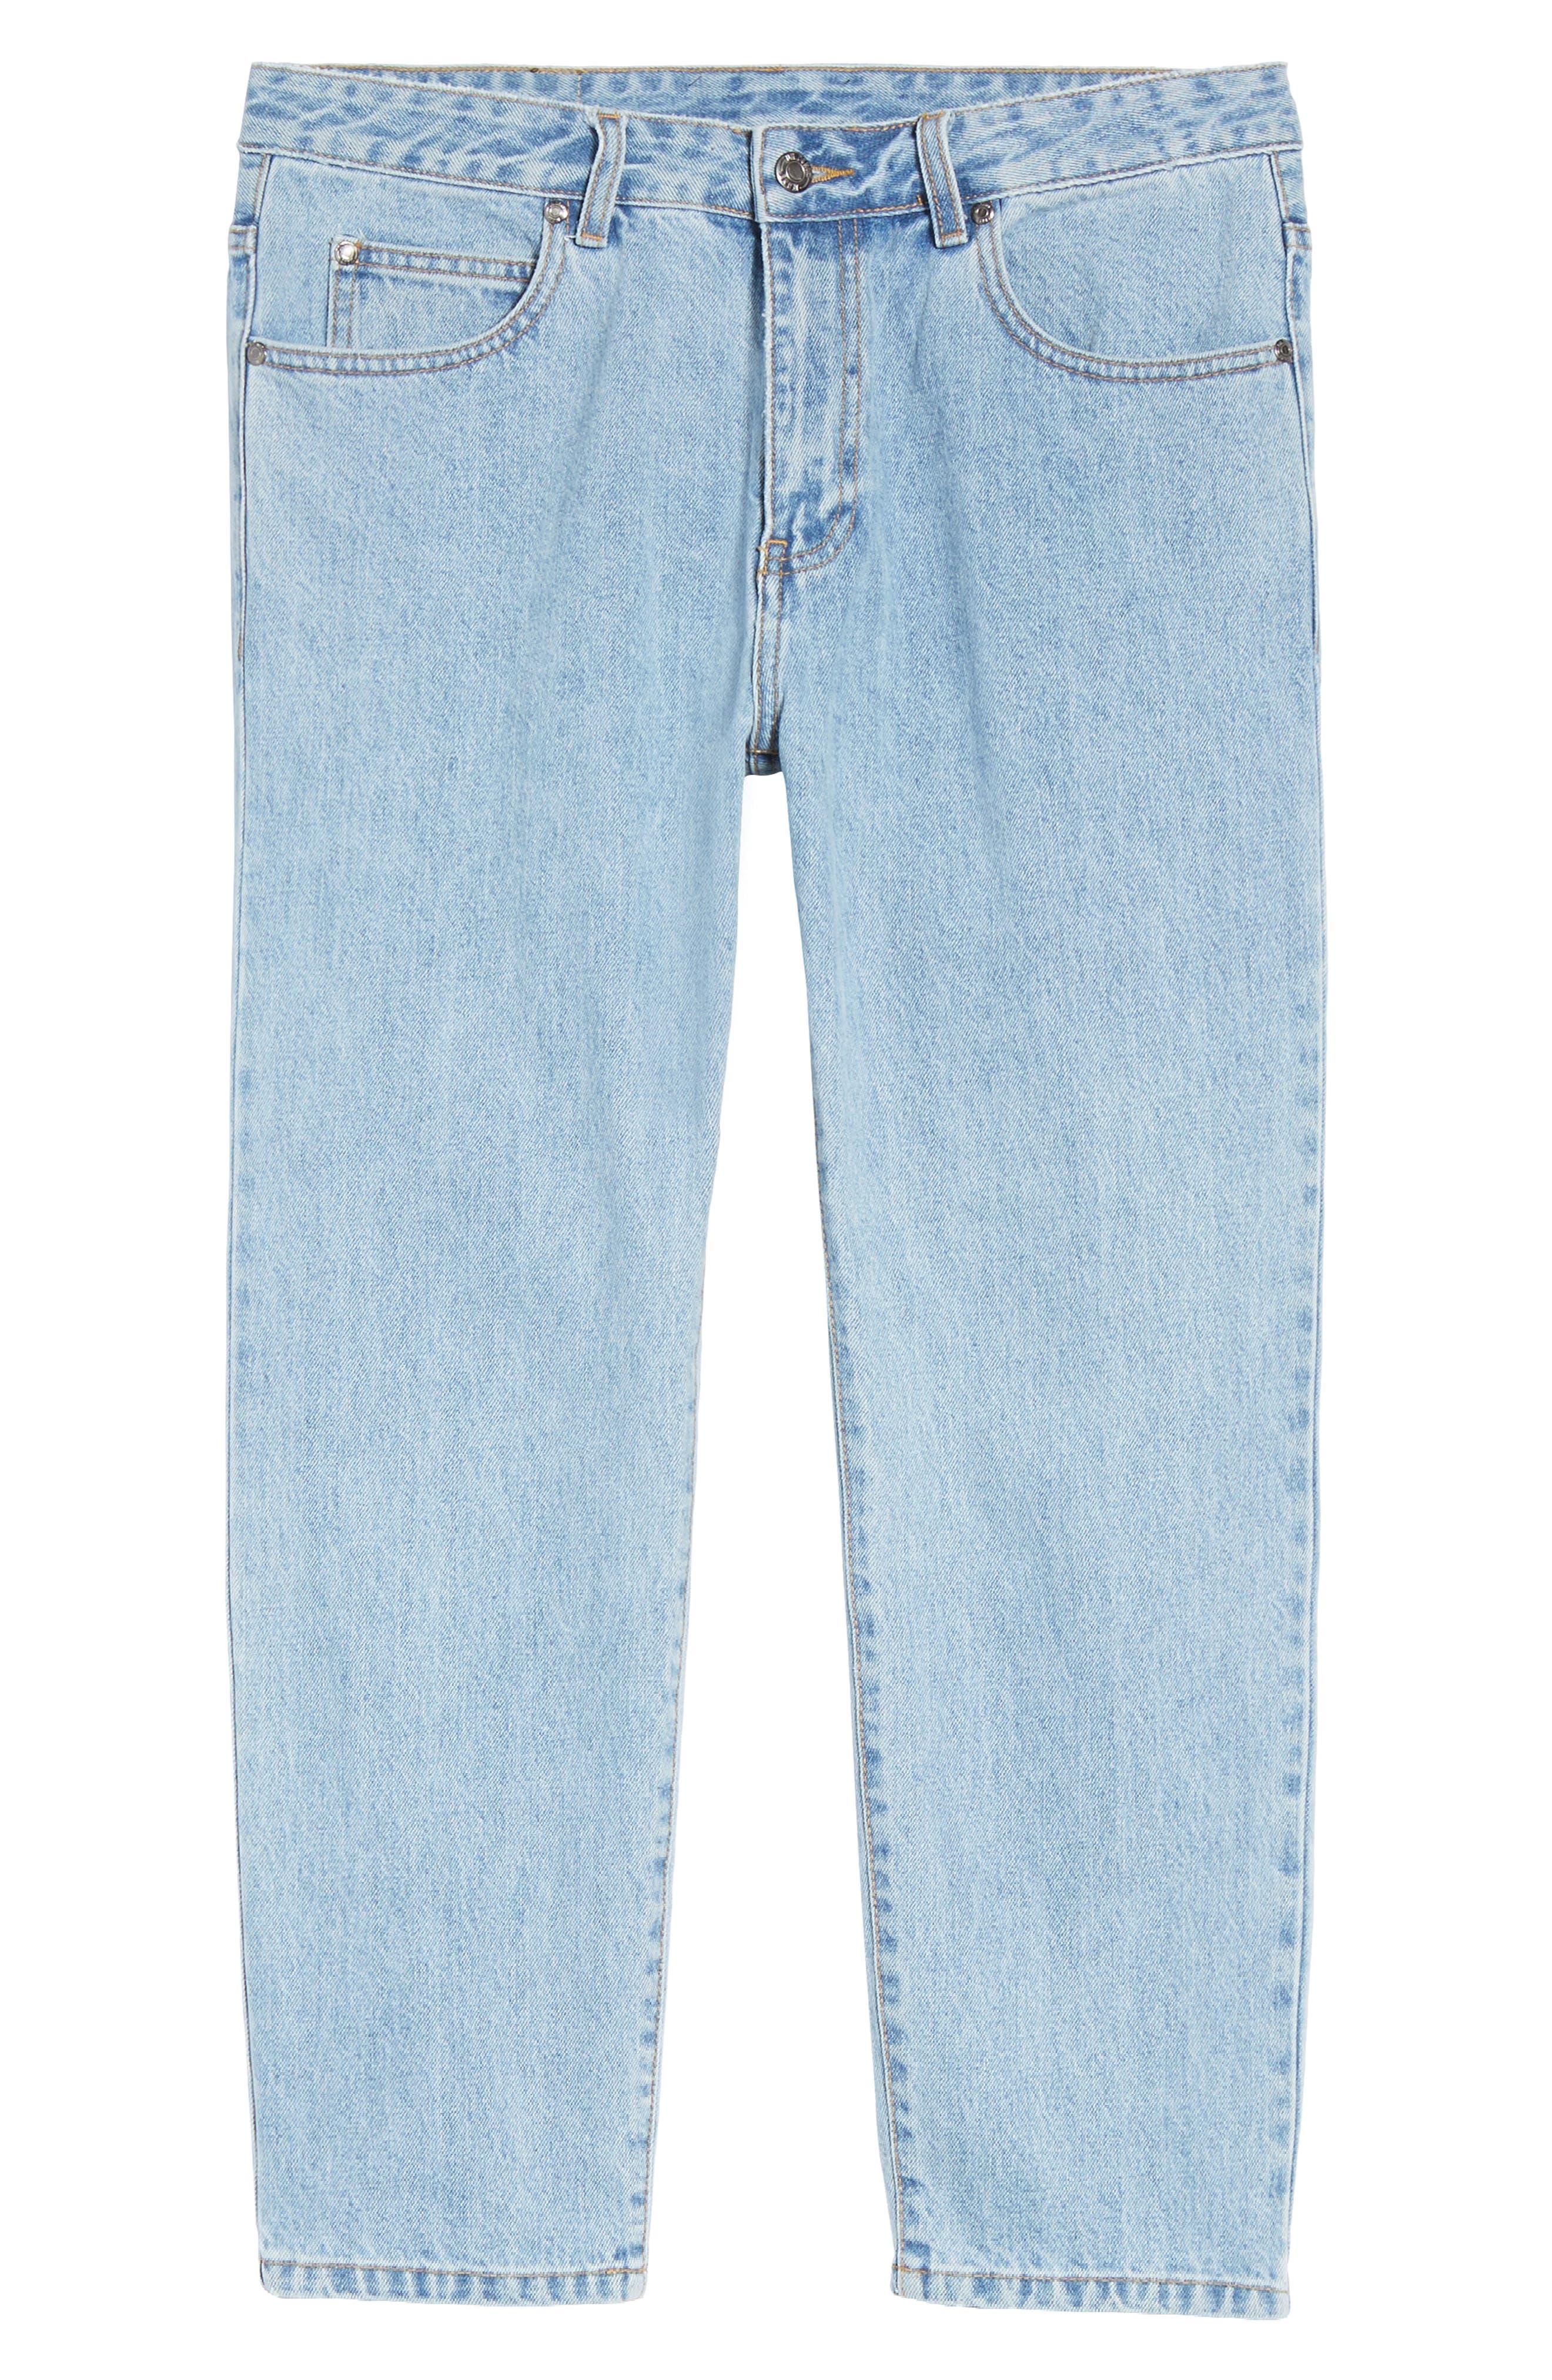 Otis Straight Fit Jeans,                             Alternate thumbnail 6, color,                             400